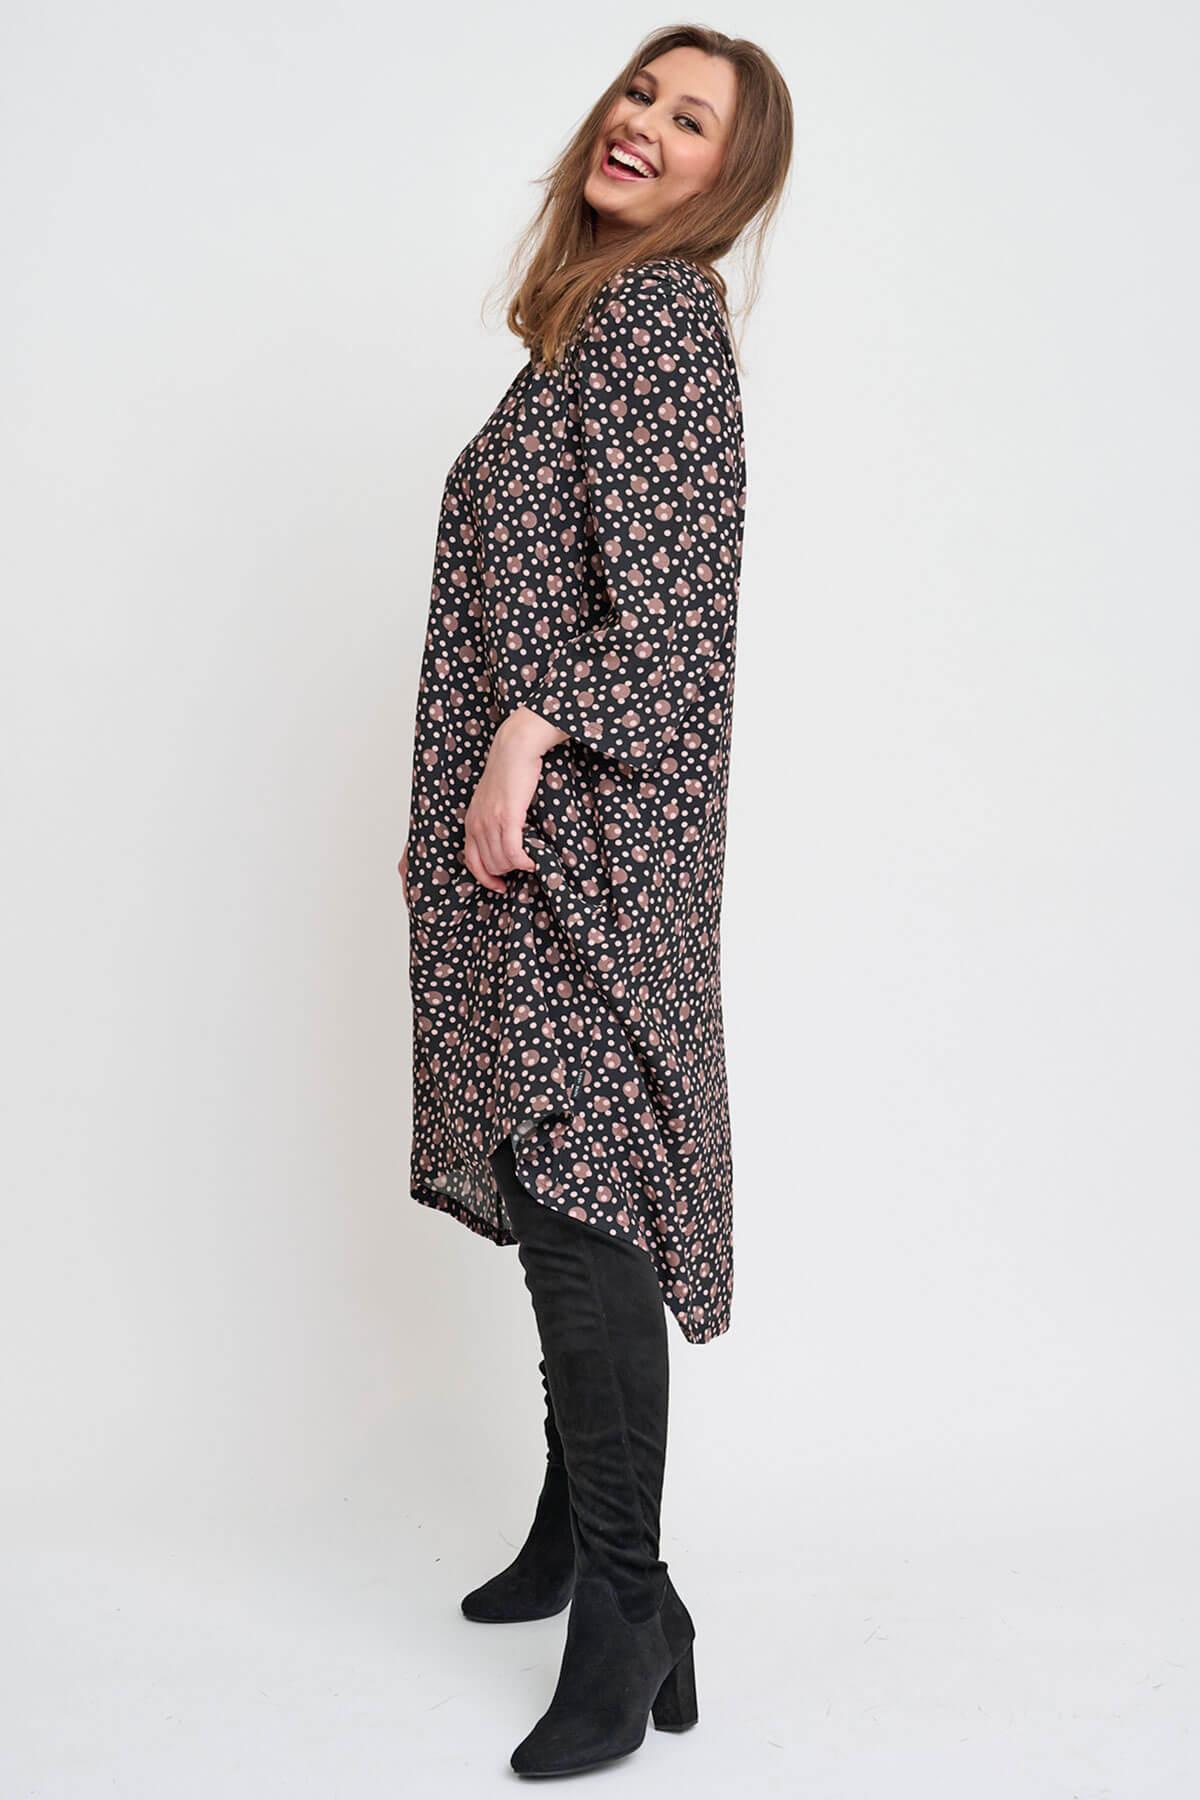 Pont Neuf Alina dress